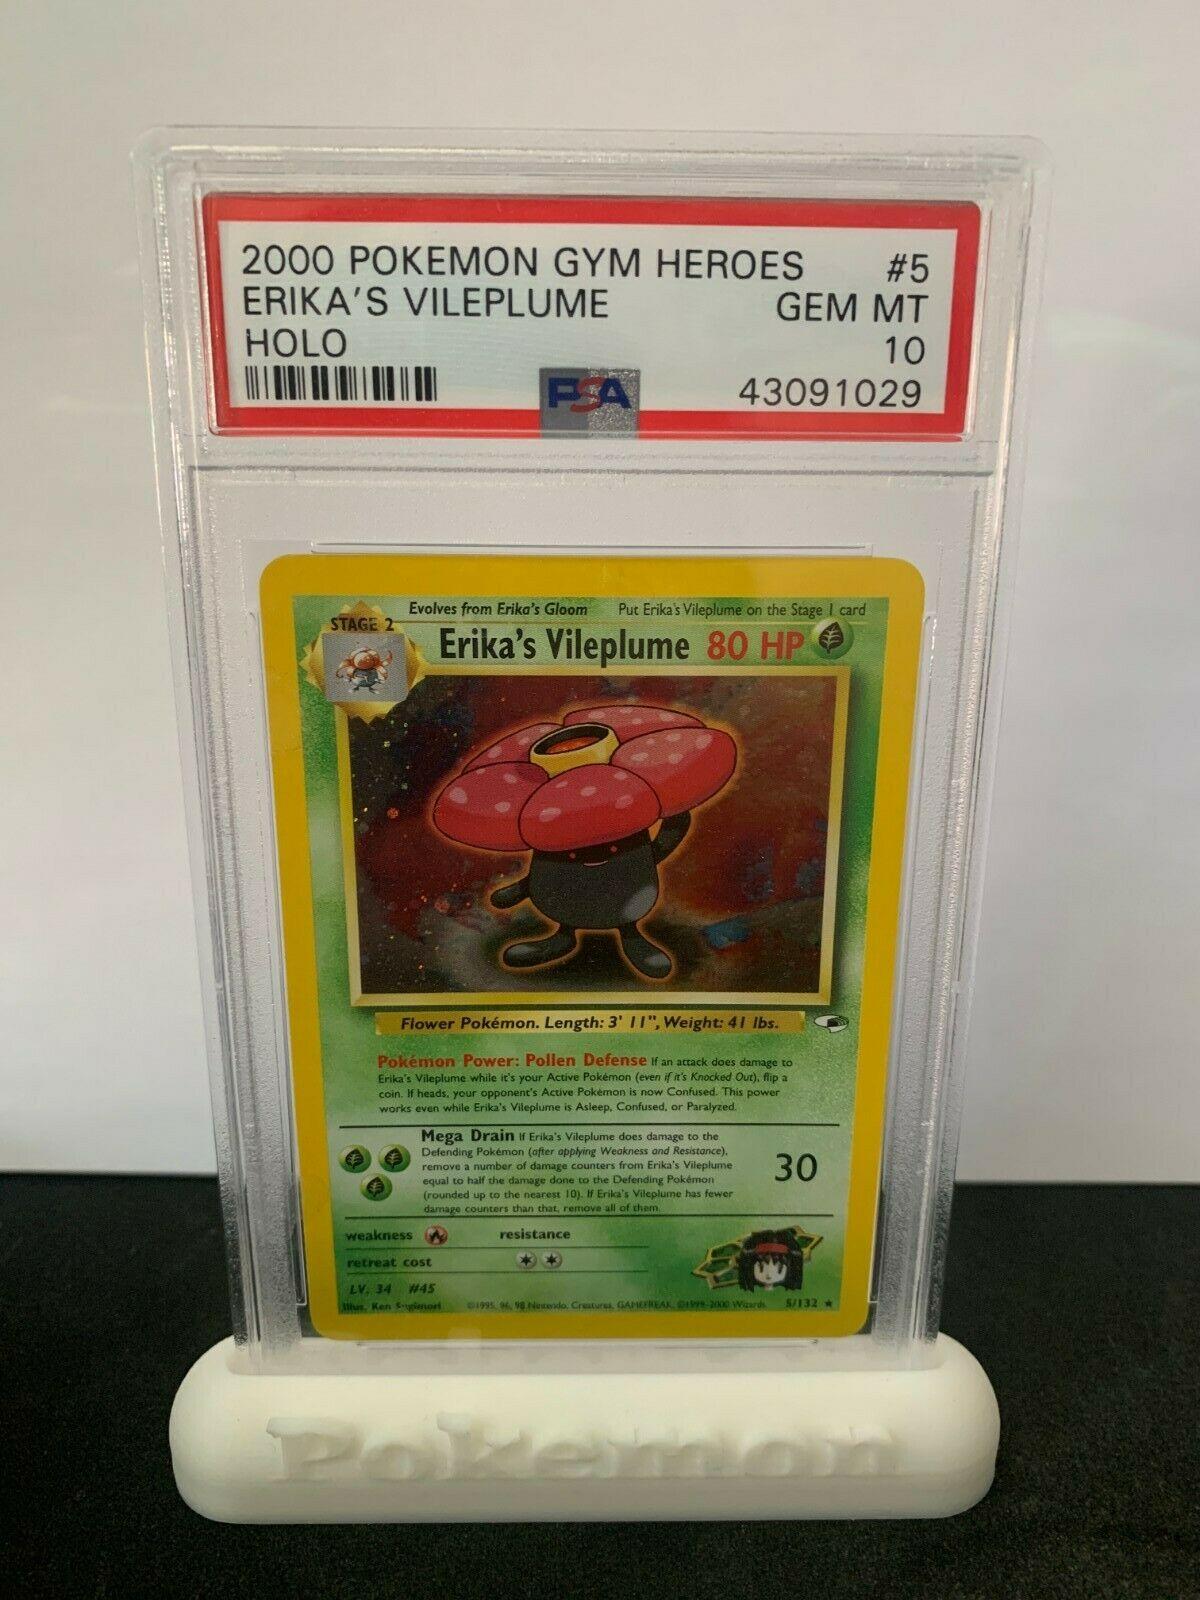 Pokemon PSA 10 Gym Heroes Erkias Vileplume Holo Rare Mint 5